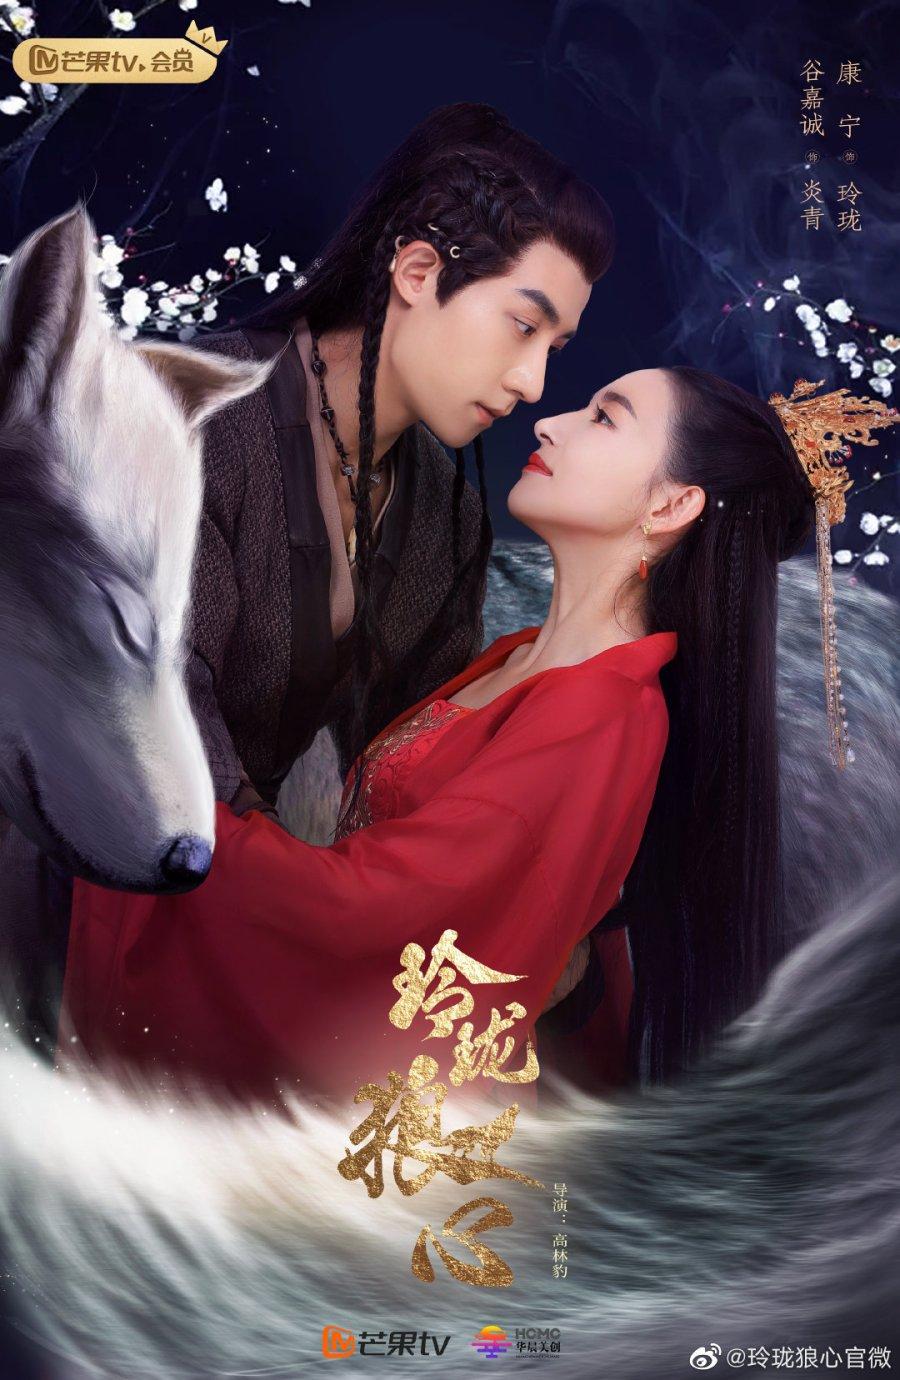 the-wolf-princess-สาวน้อยหัวใจหมาป่า-ซับไทย-ep-1-24